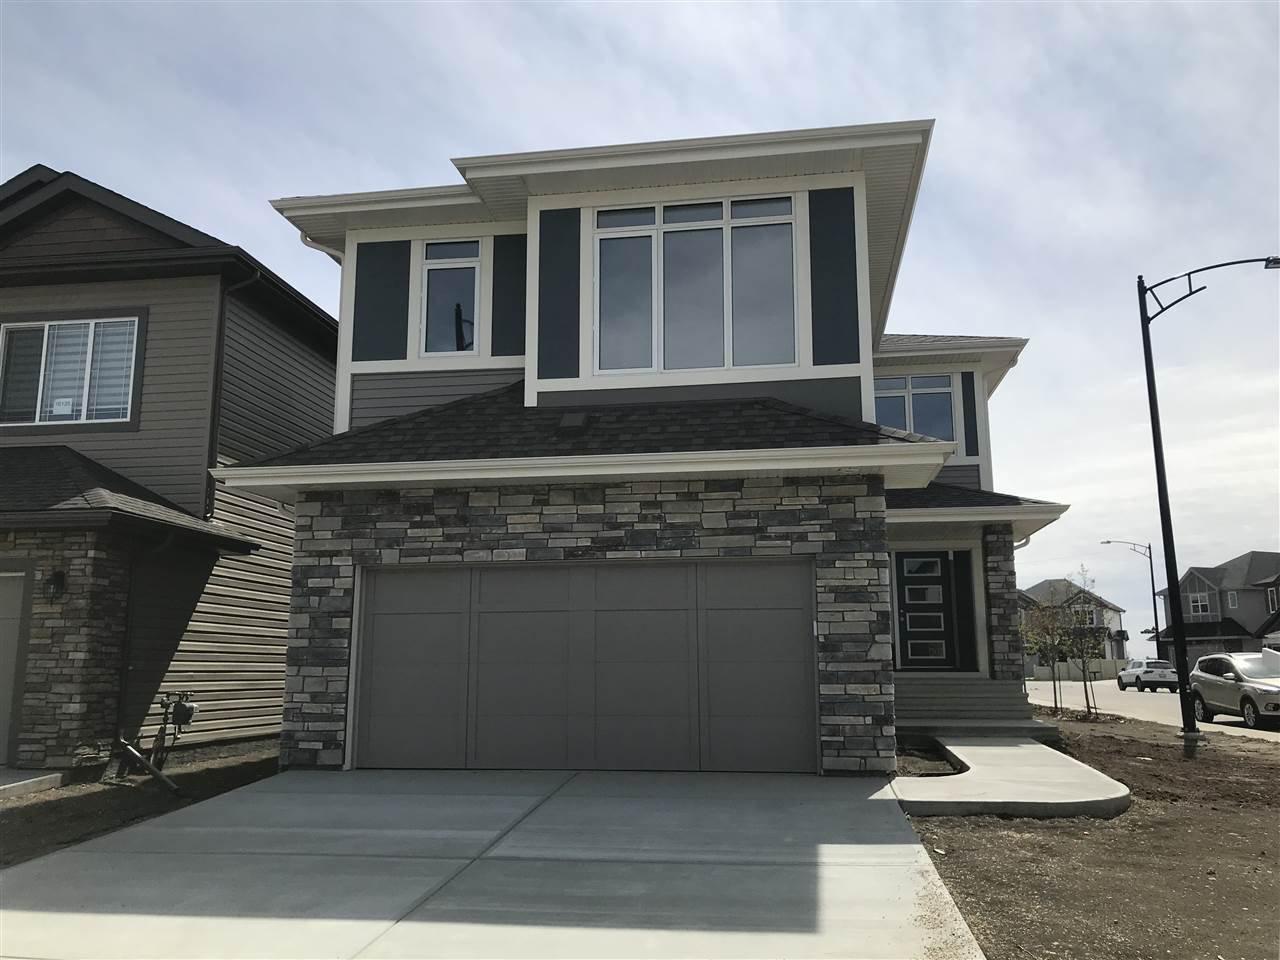 Main Photo: 16139 17 Avenue in Edmonton: Zone 56 House for sale : MLS®# E4178284